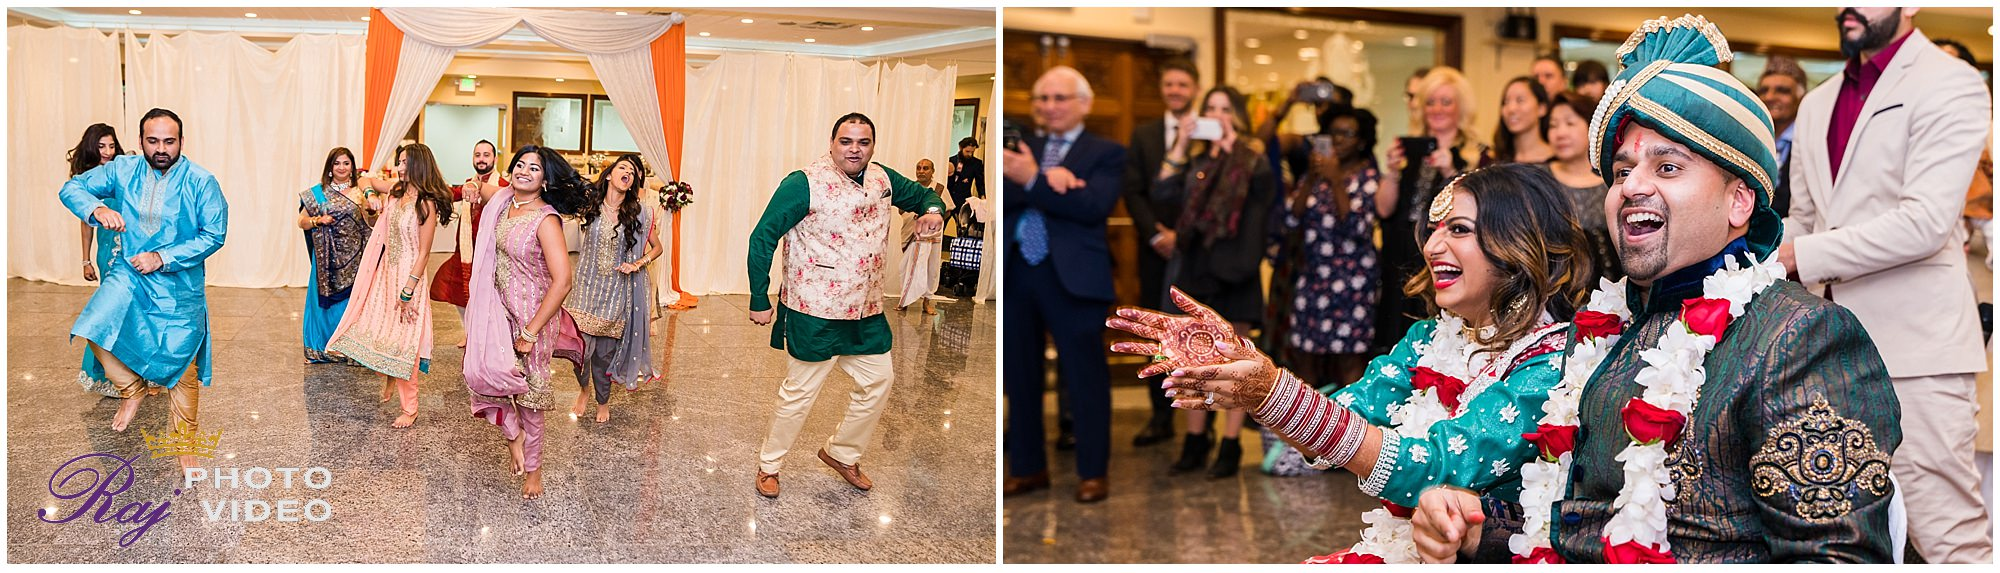 Sri-Guruvaayoorappan-Temple-Marlboro-NJ-Indian-Wedding-Chiyomi-Scott-00030.jpg